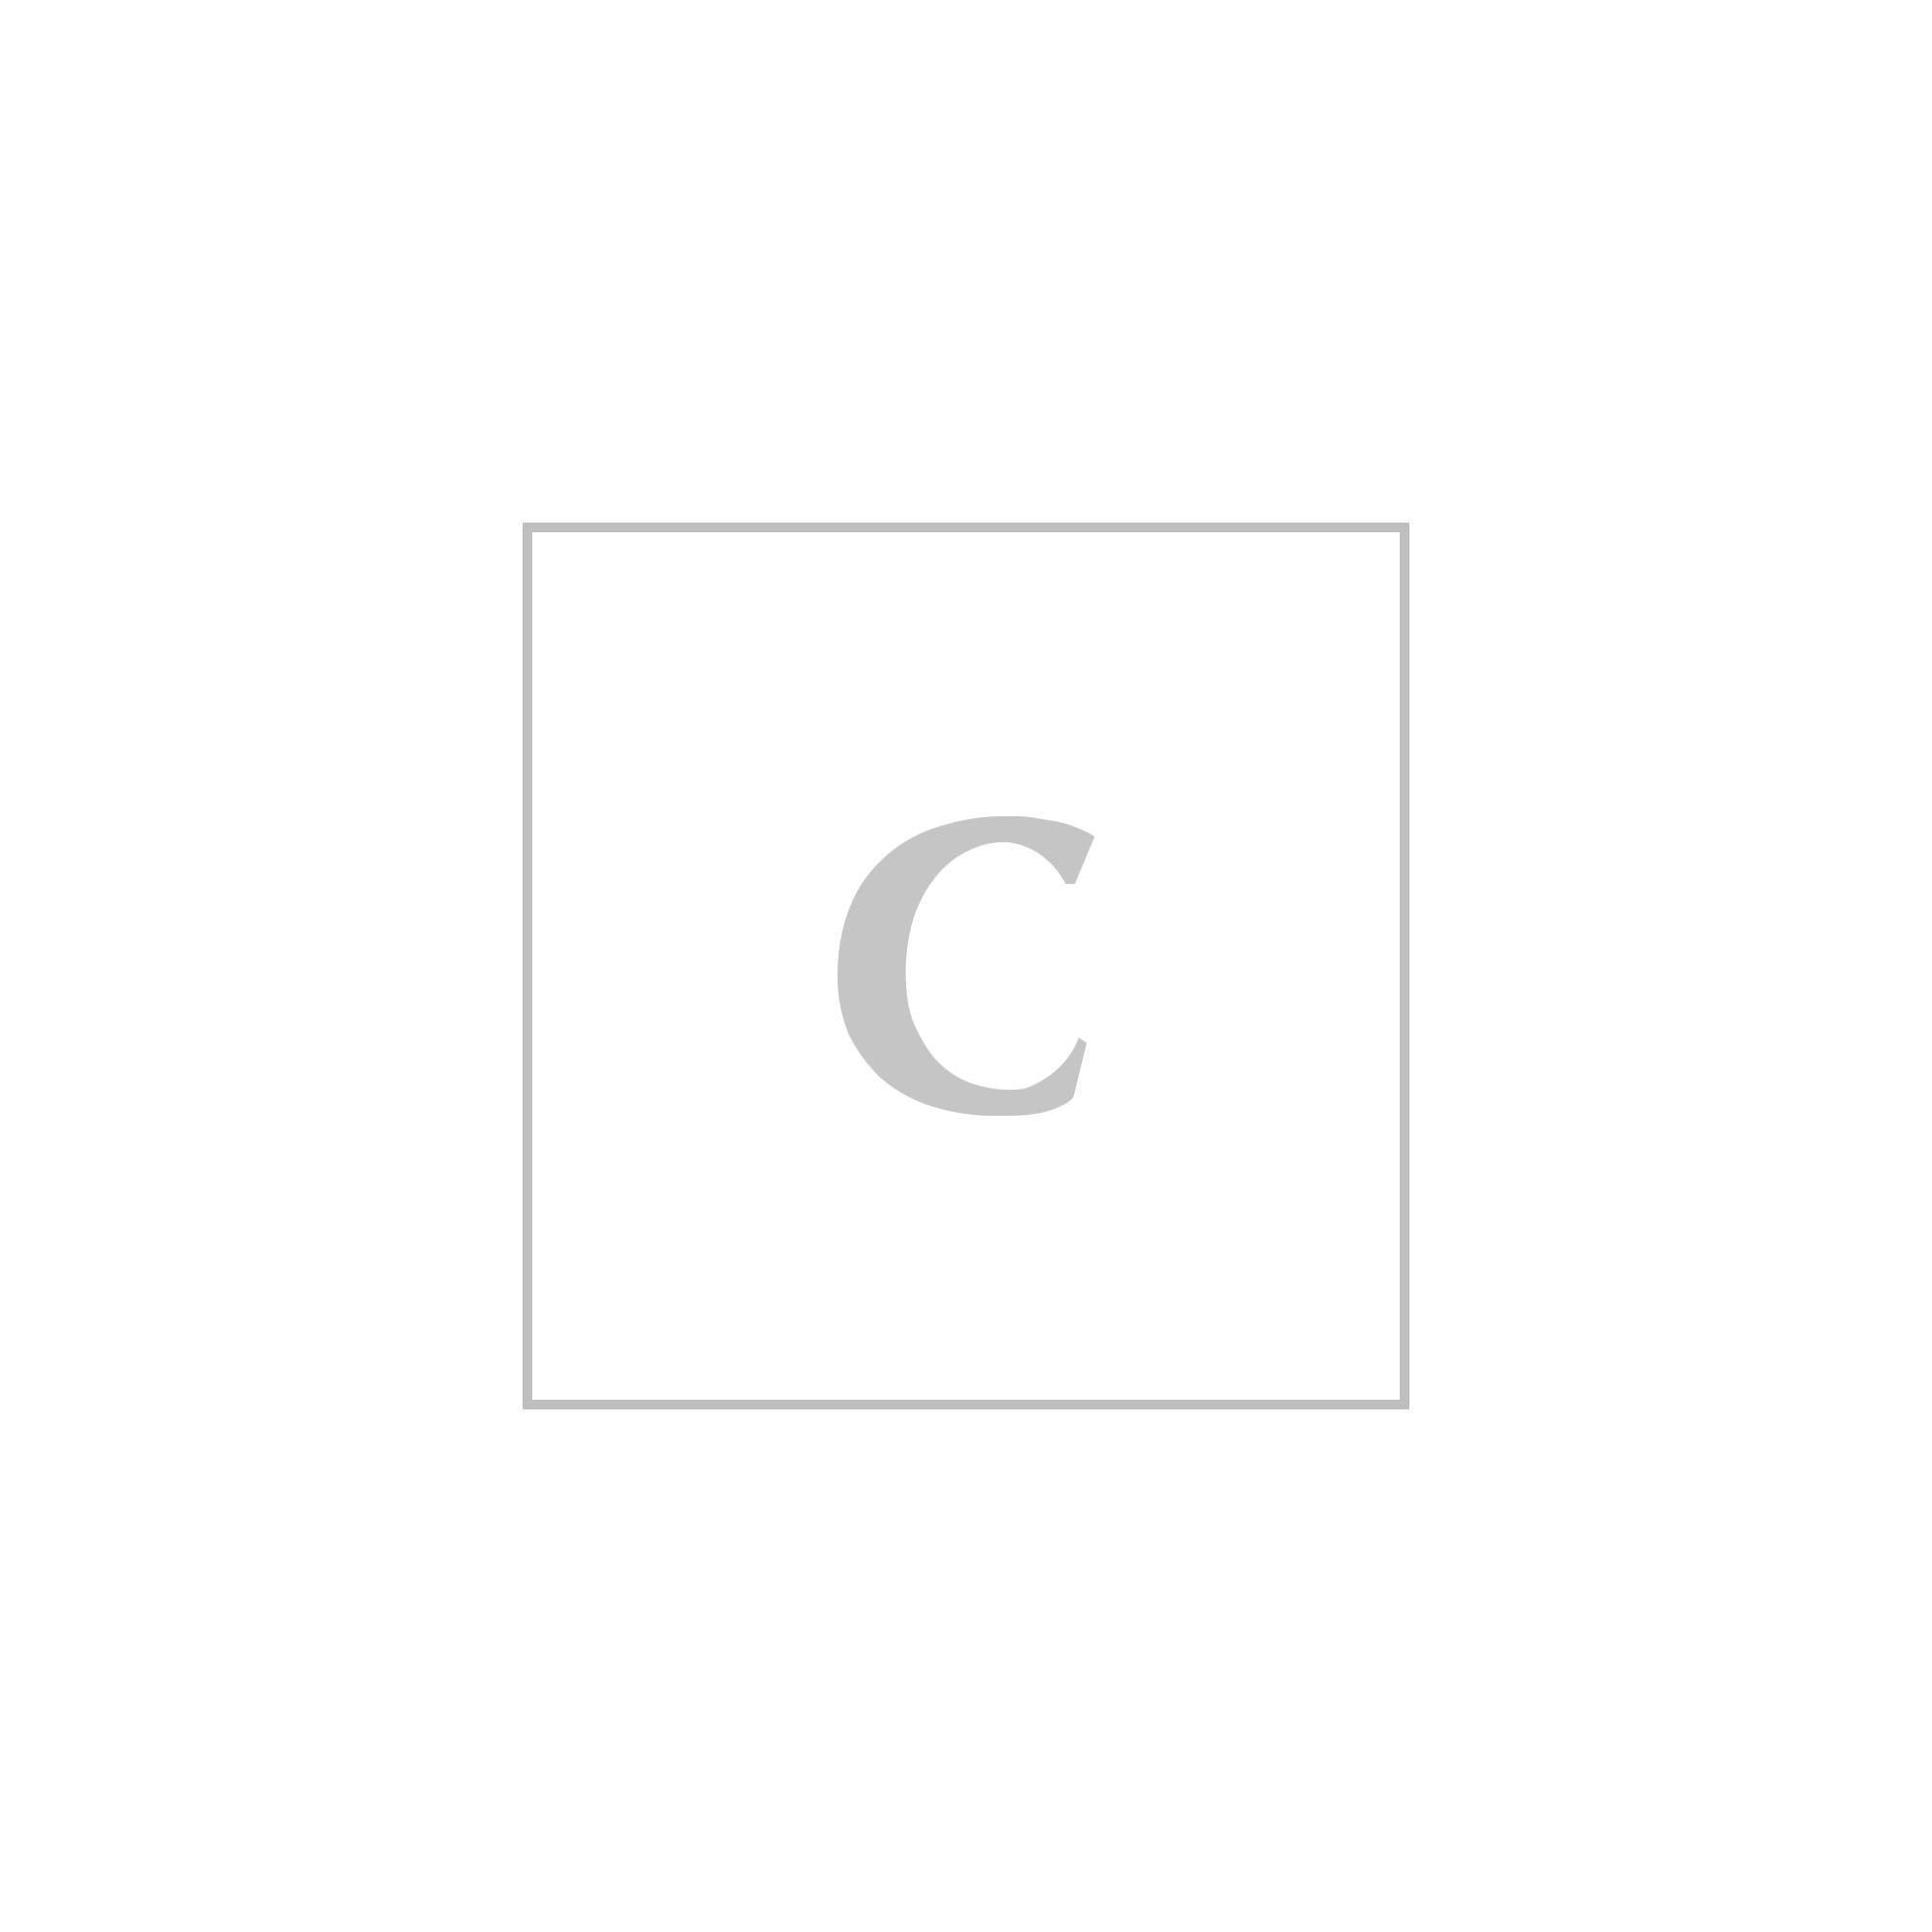 Dolce & gabbana stivale basso coco jersey